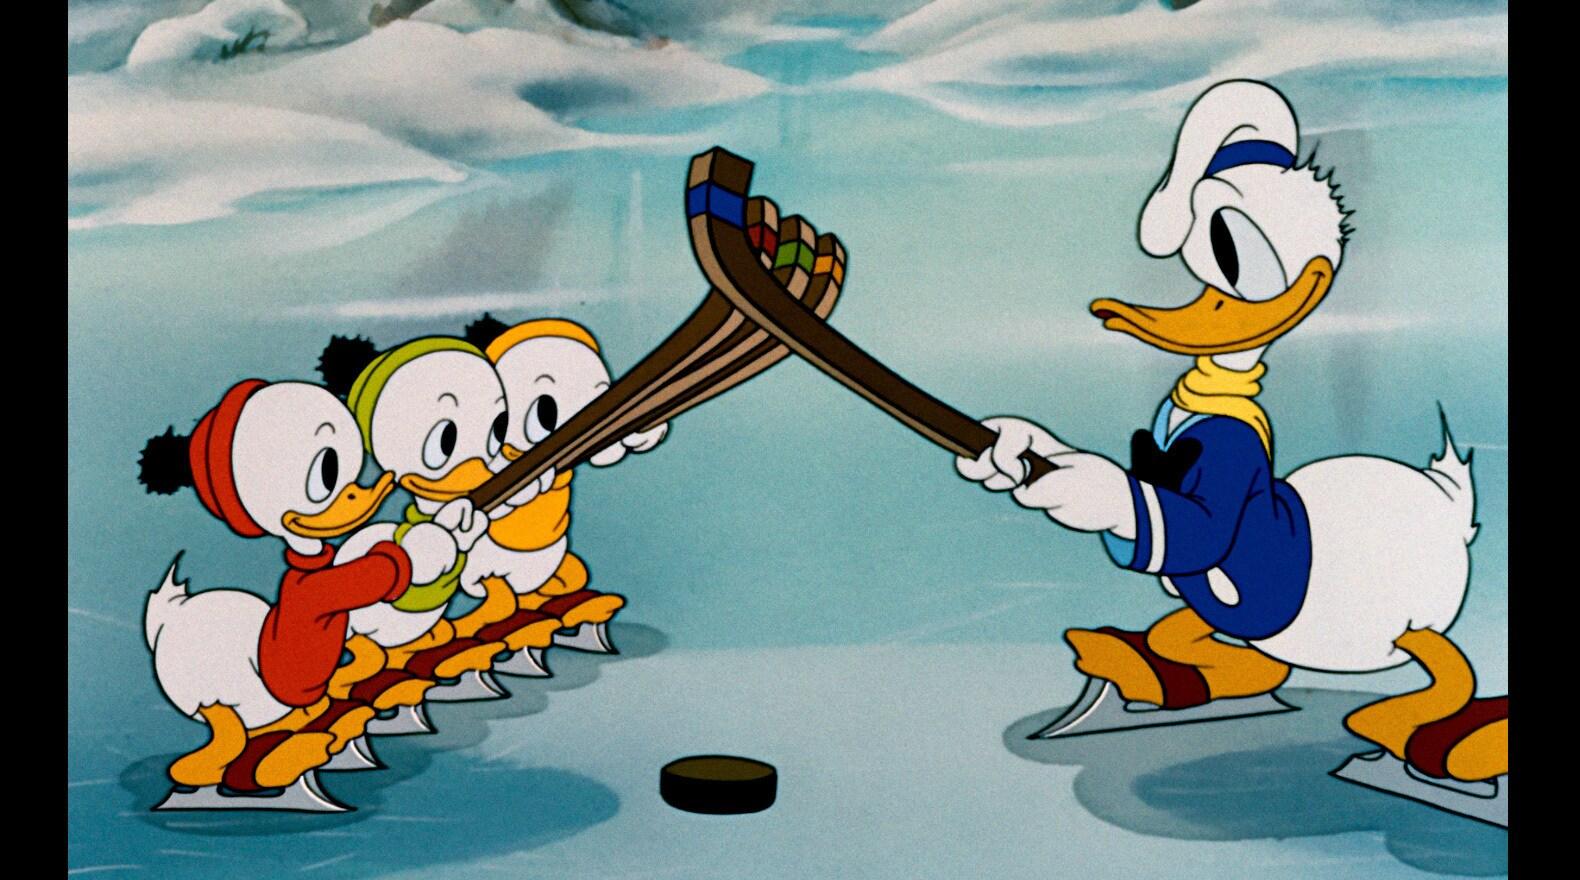 Donald and His Nephews